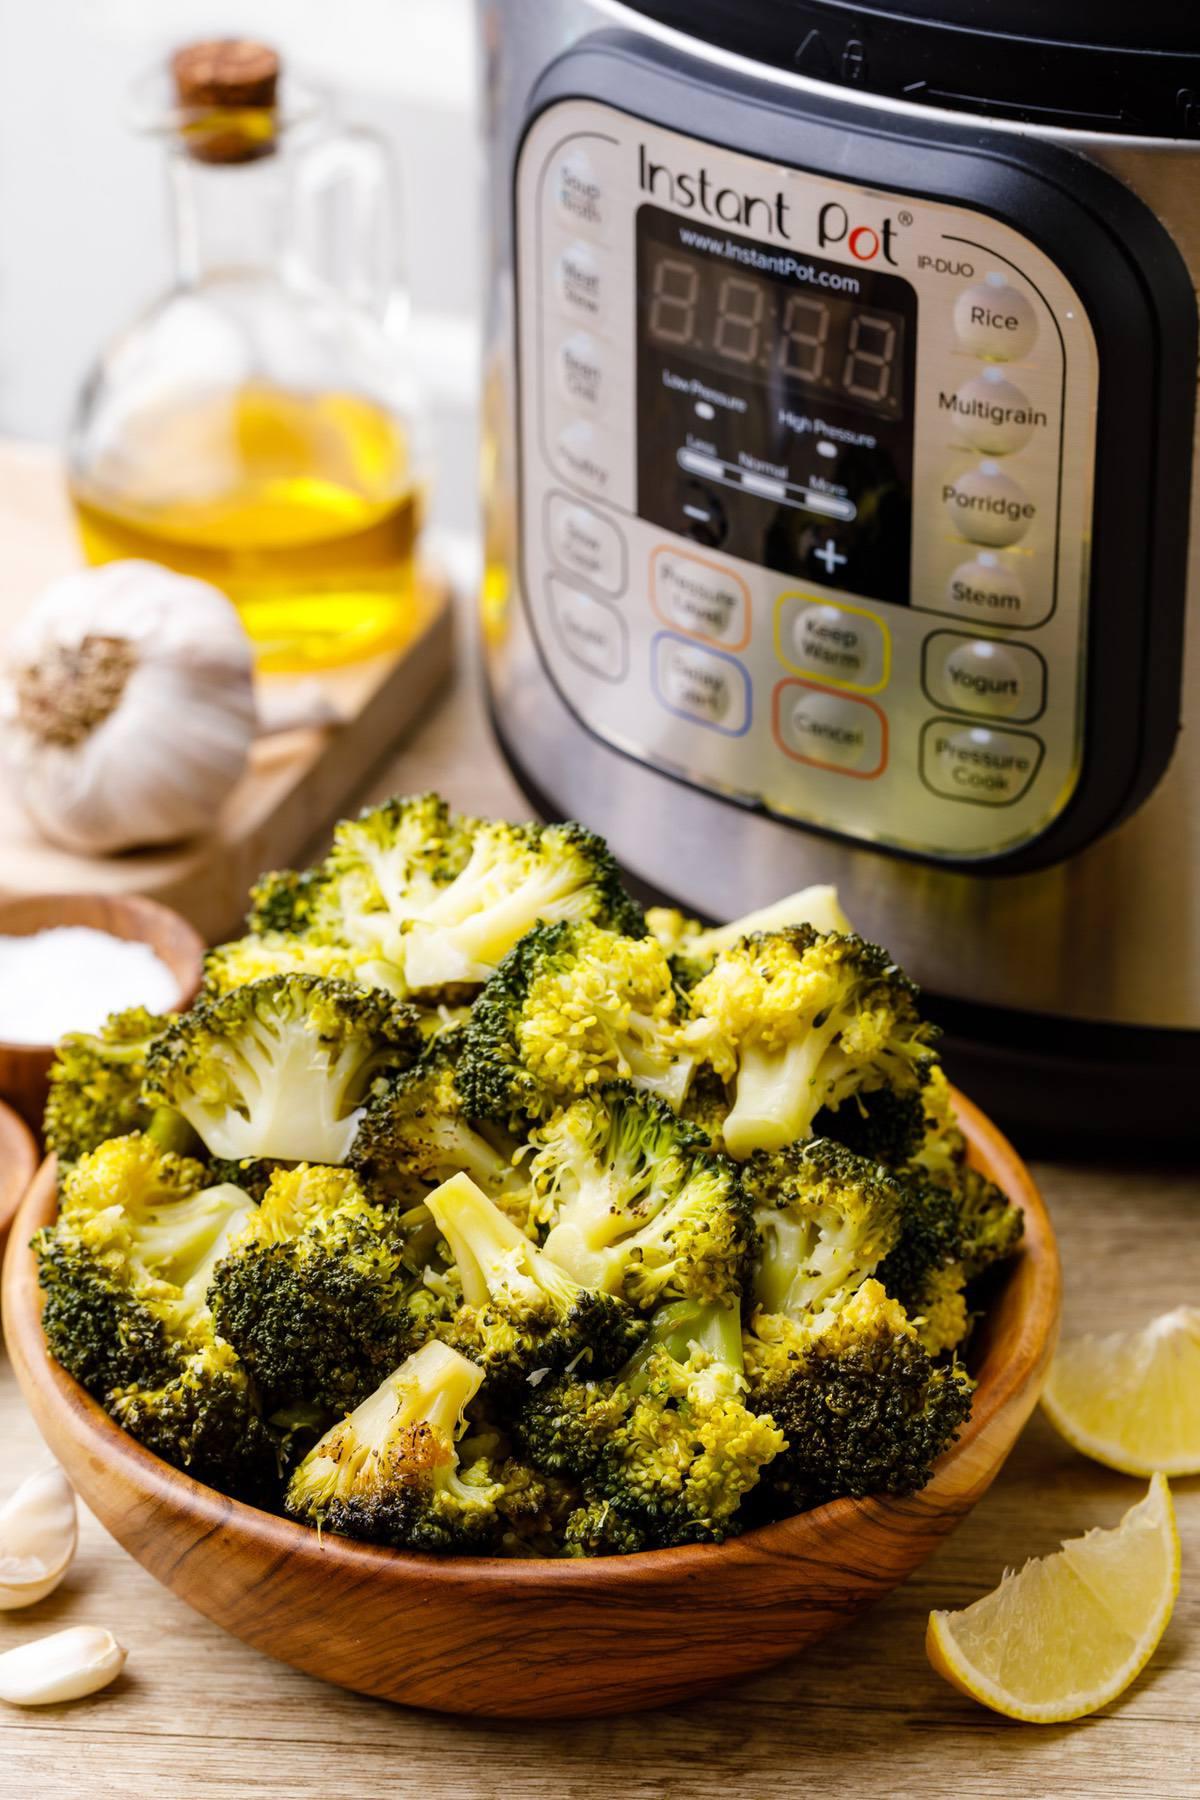 Instant Pot Garlic Roasted Broccoli